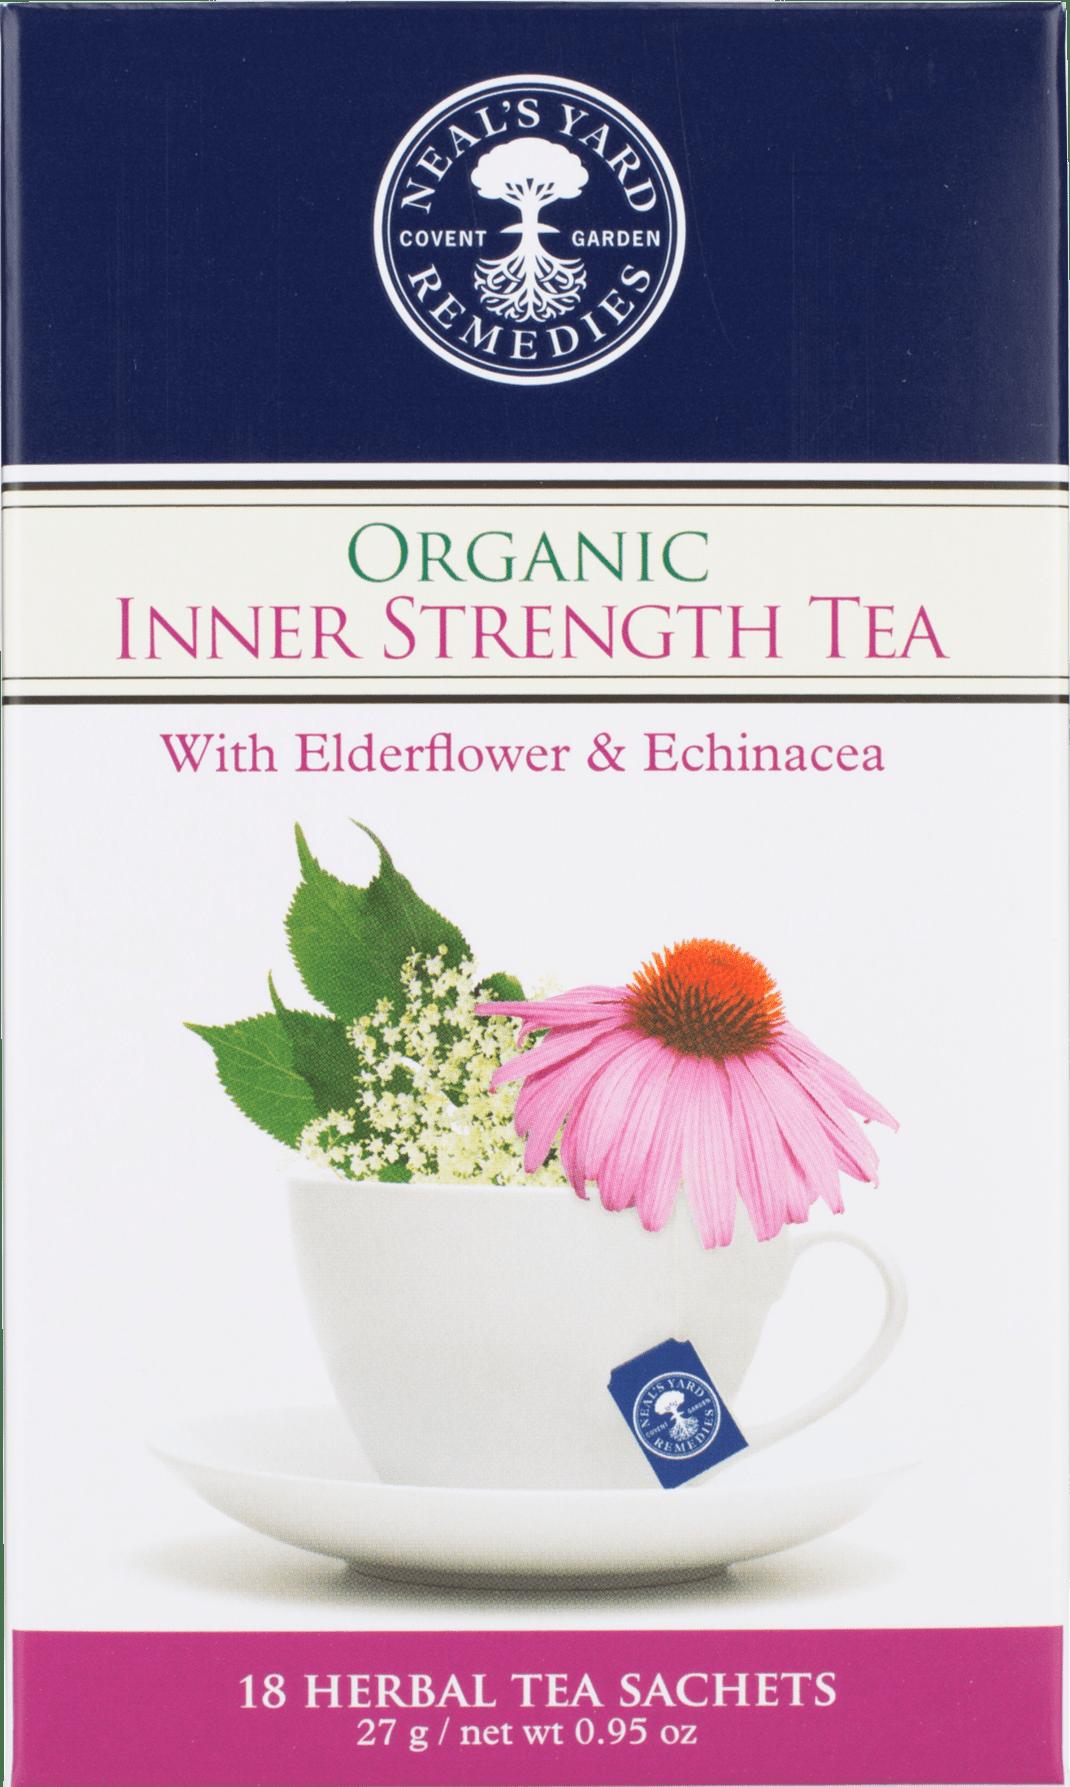 Benefit-led Herbal Teas